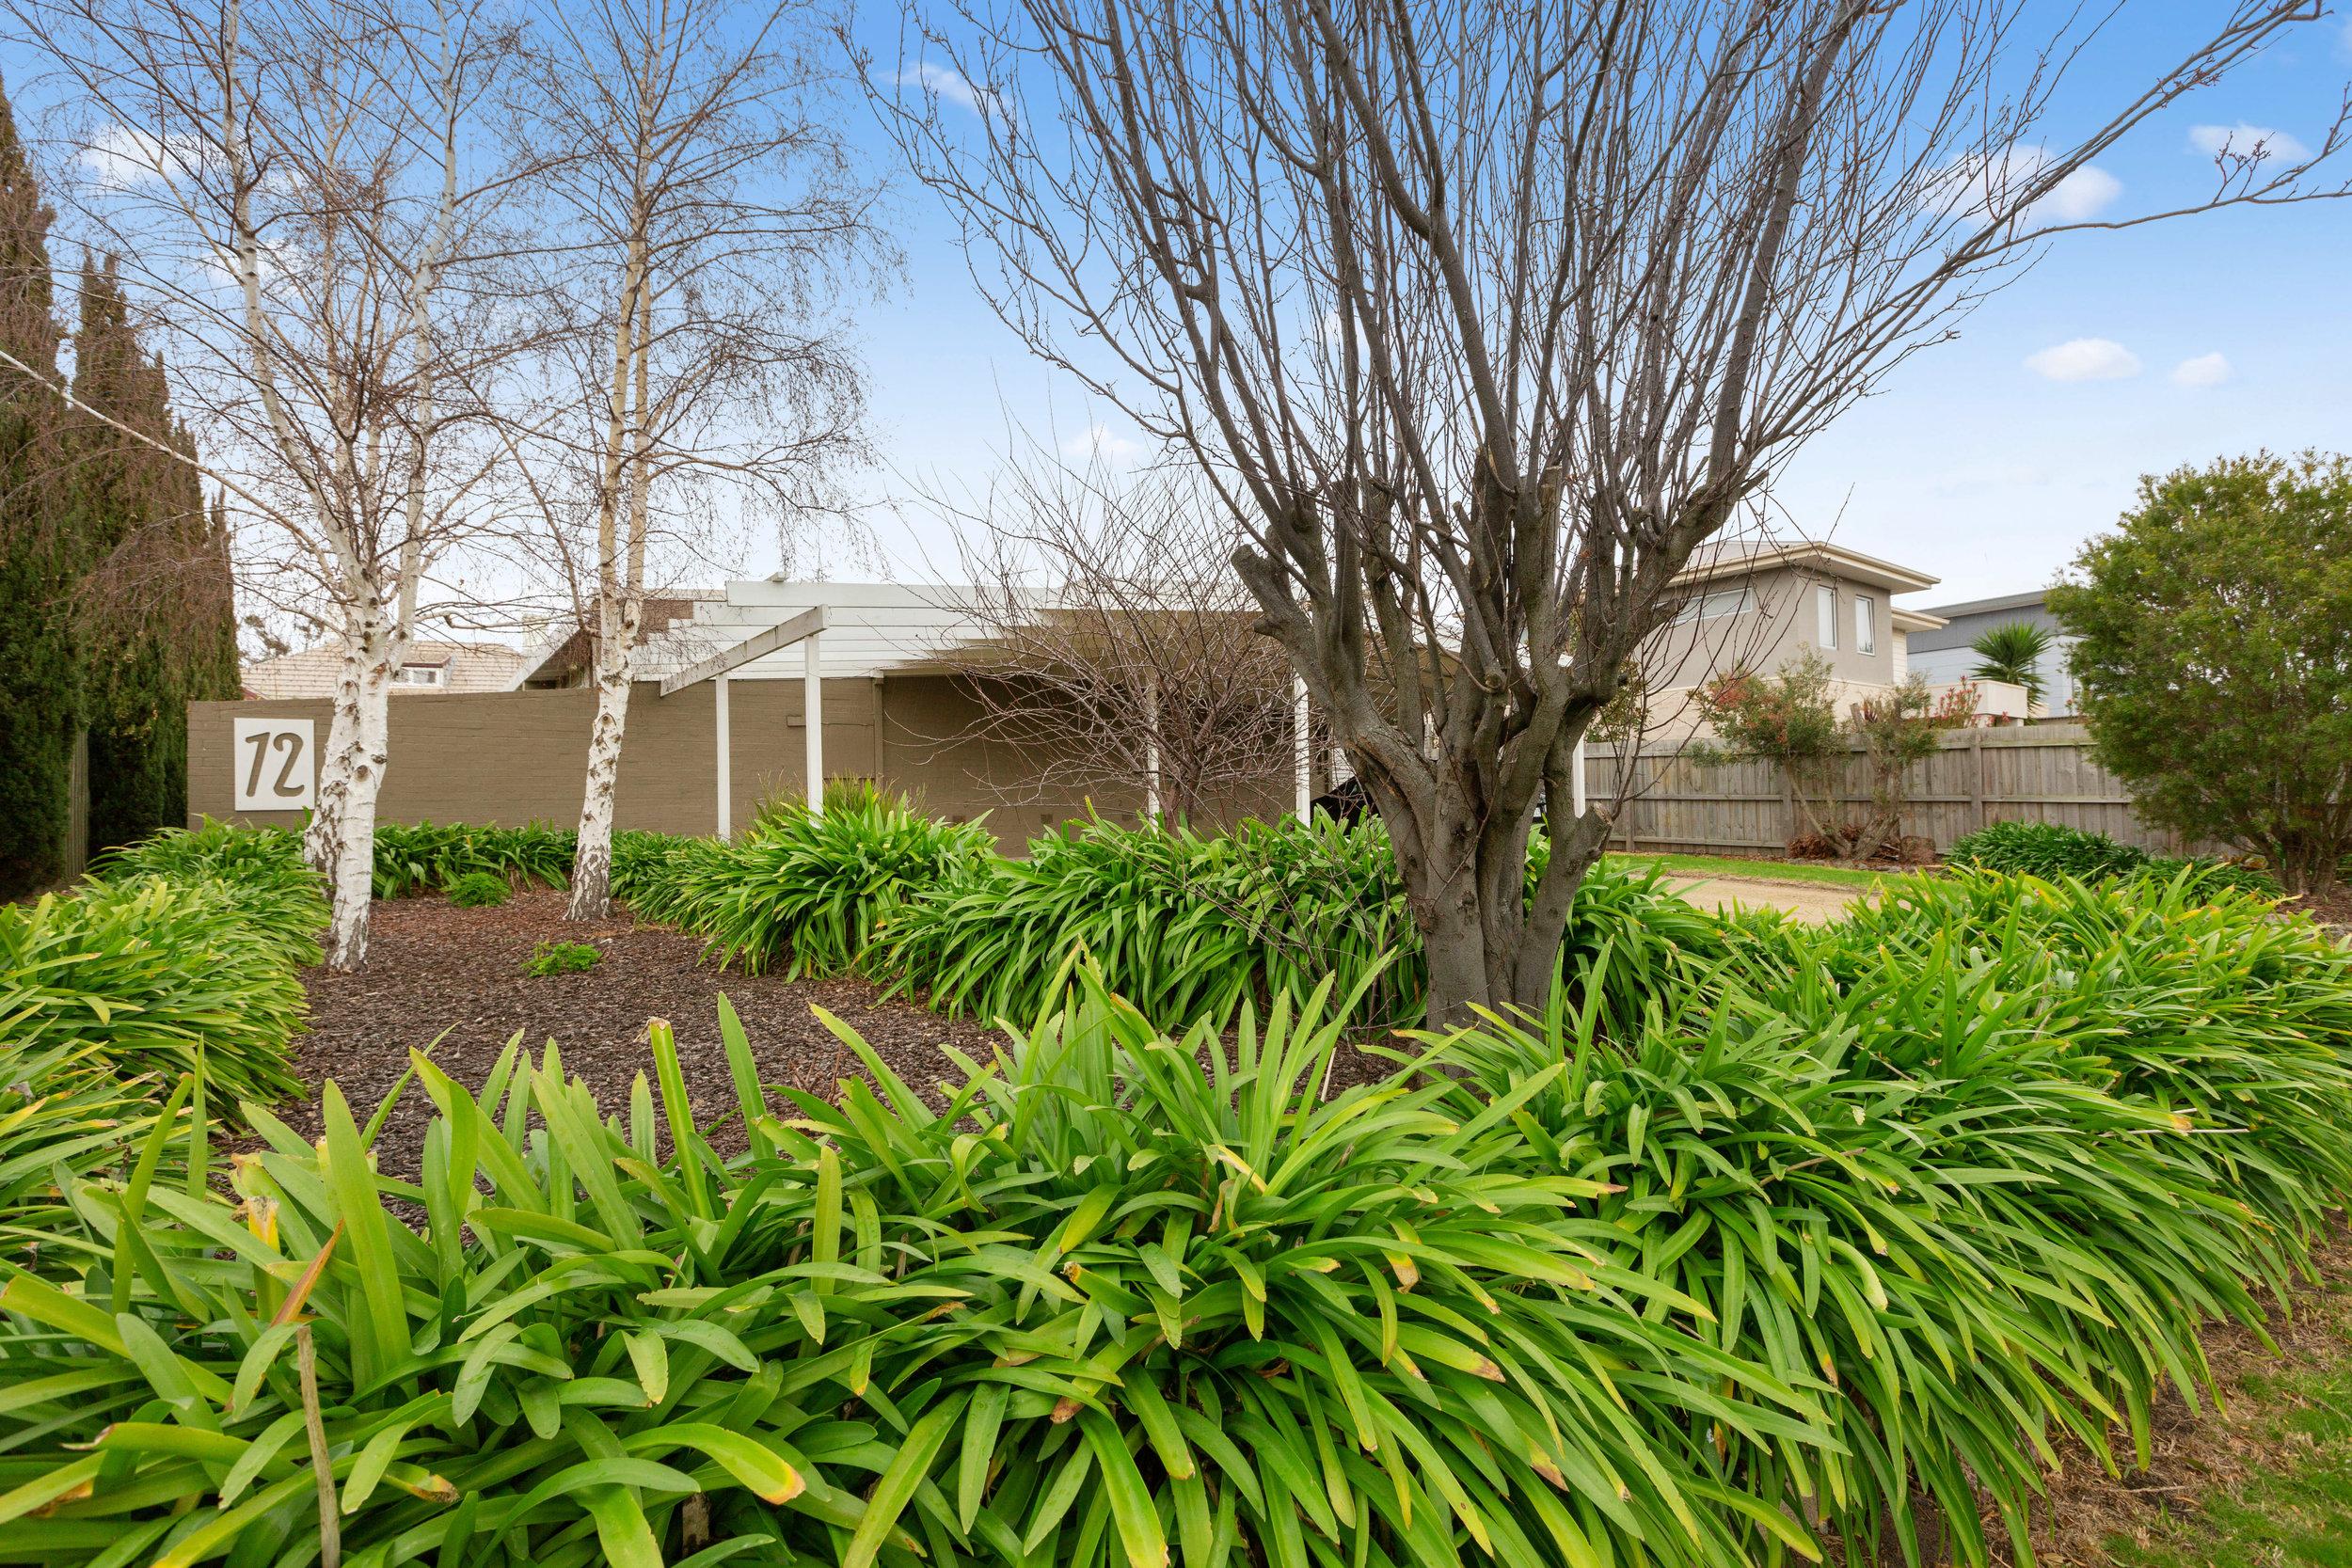 3/12 Campbell Grove, Mornington SOLD $508,000 (2018)